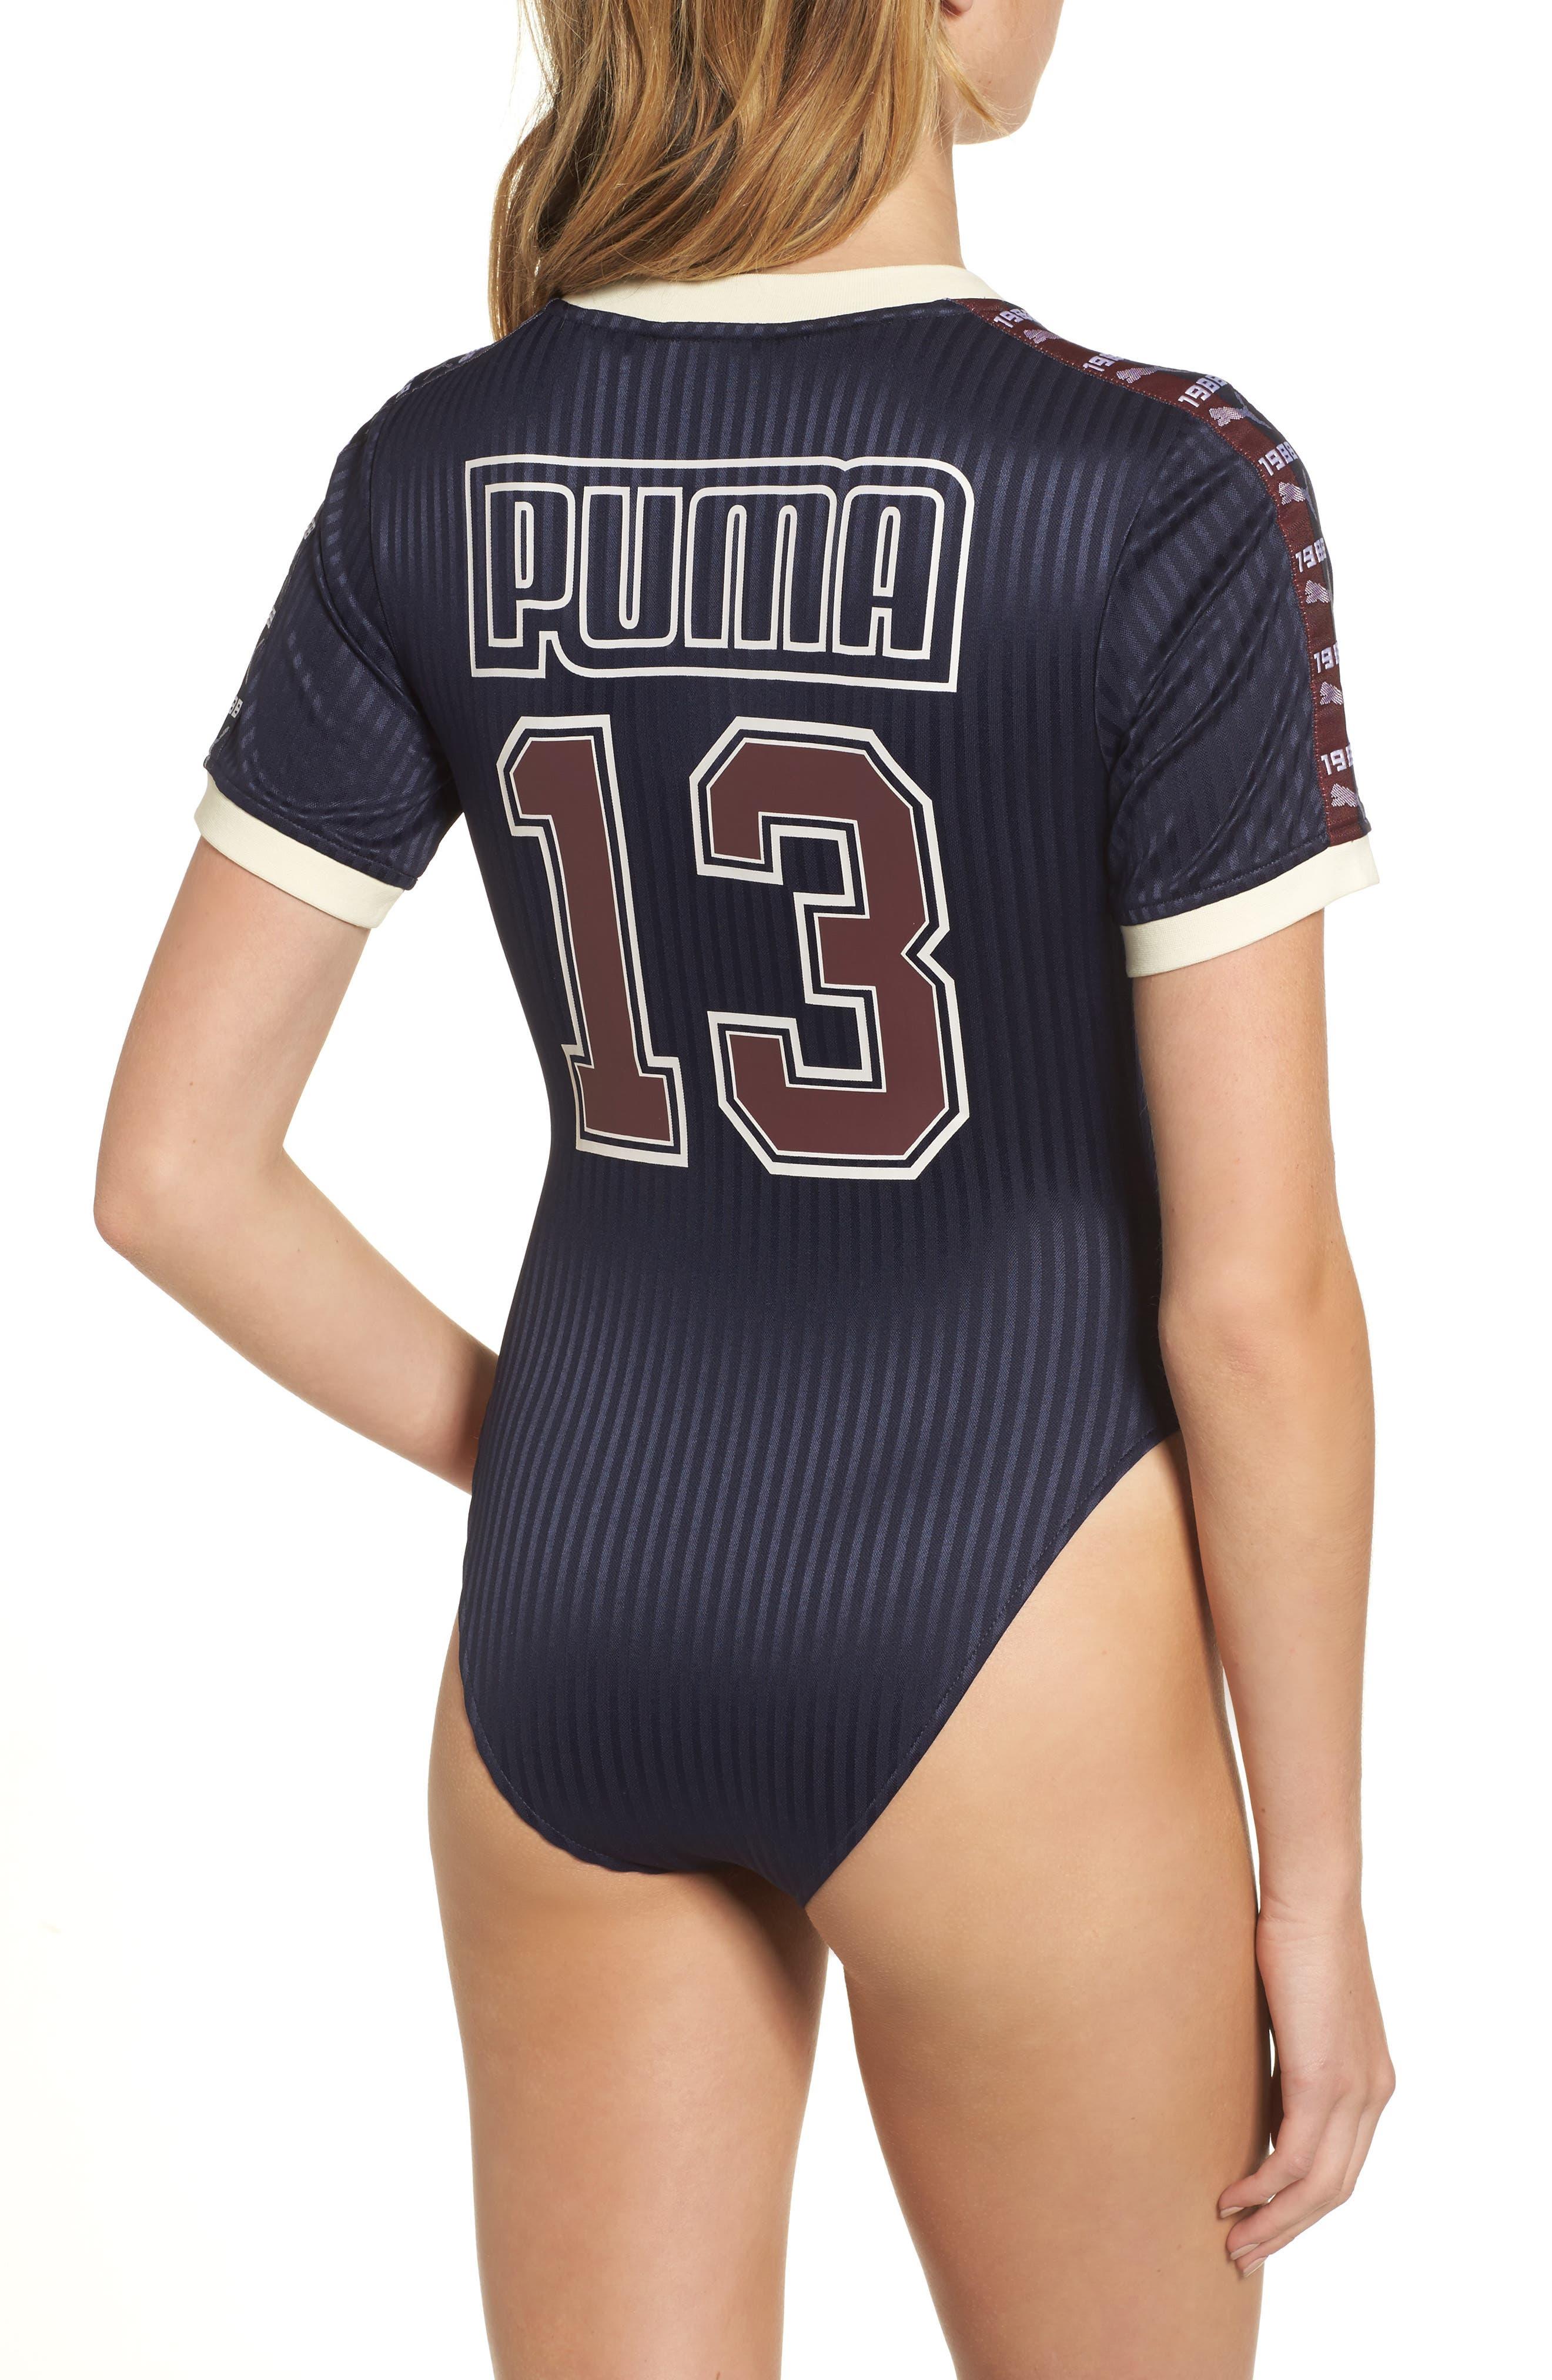 FENTY PUMA by Rihanna Bodysuit,                             Alternate thumbnail 2, color,                             Navy